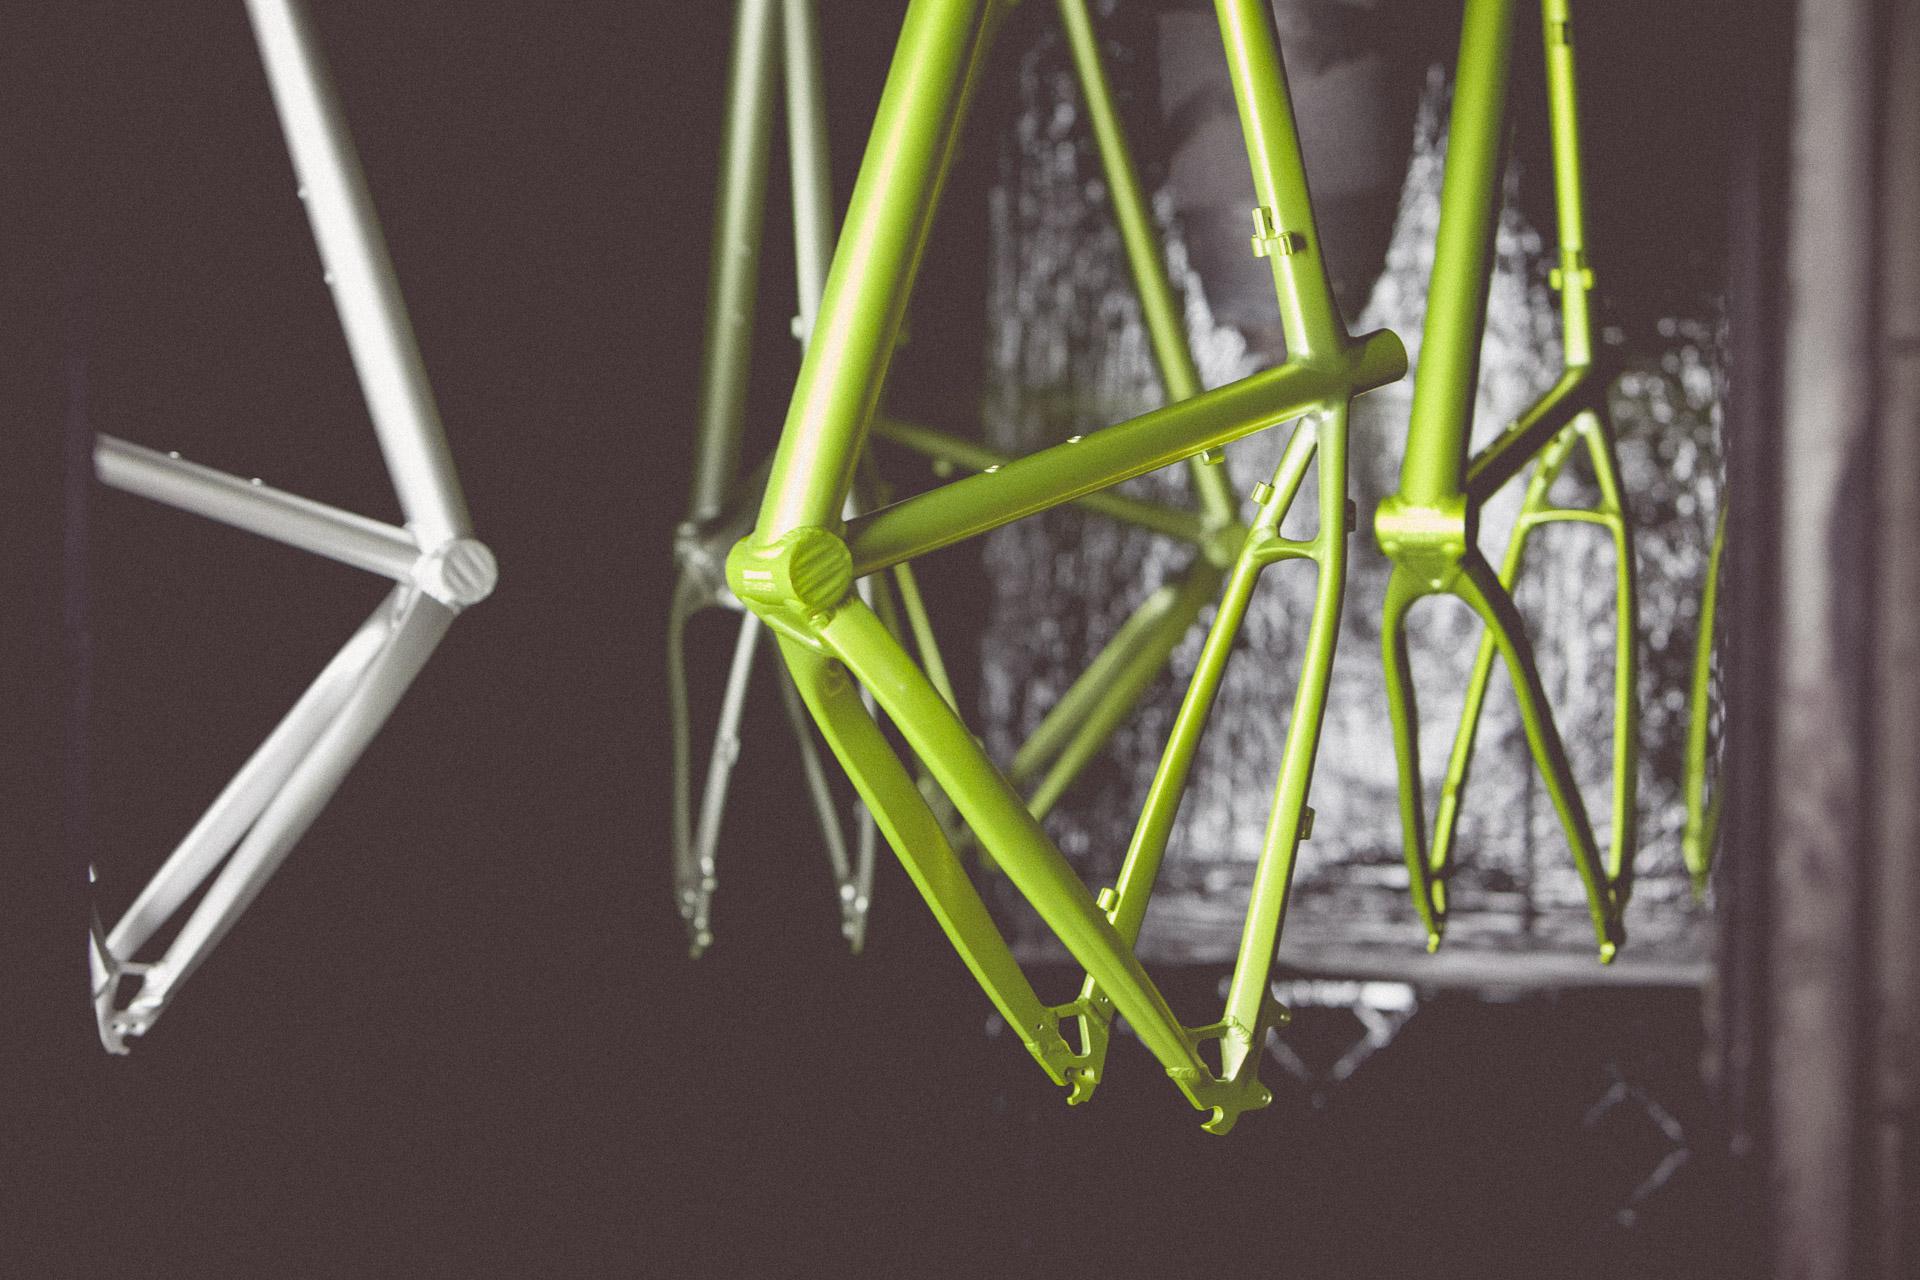 08-Derby-Cycle-Werke-Fahrradproduktion